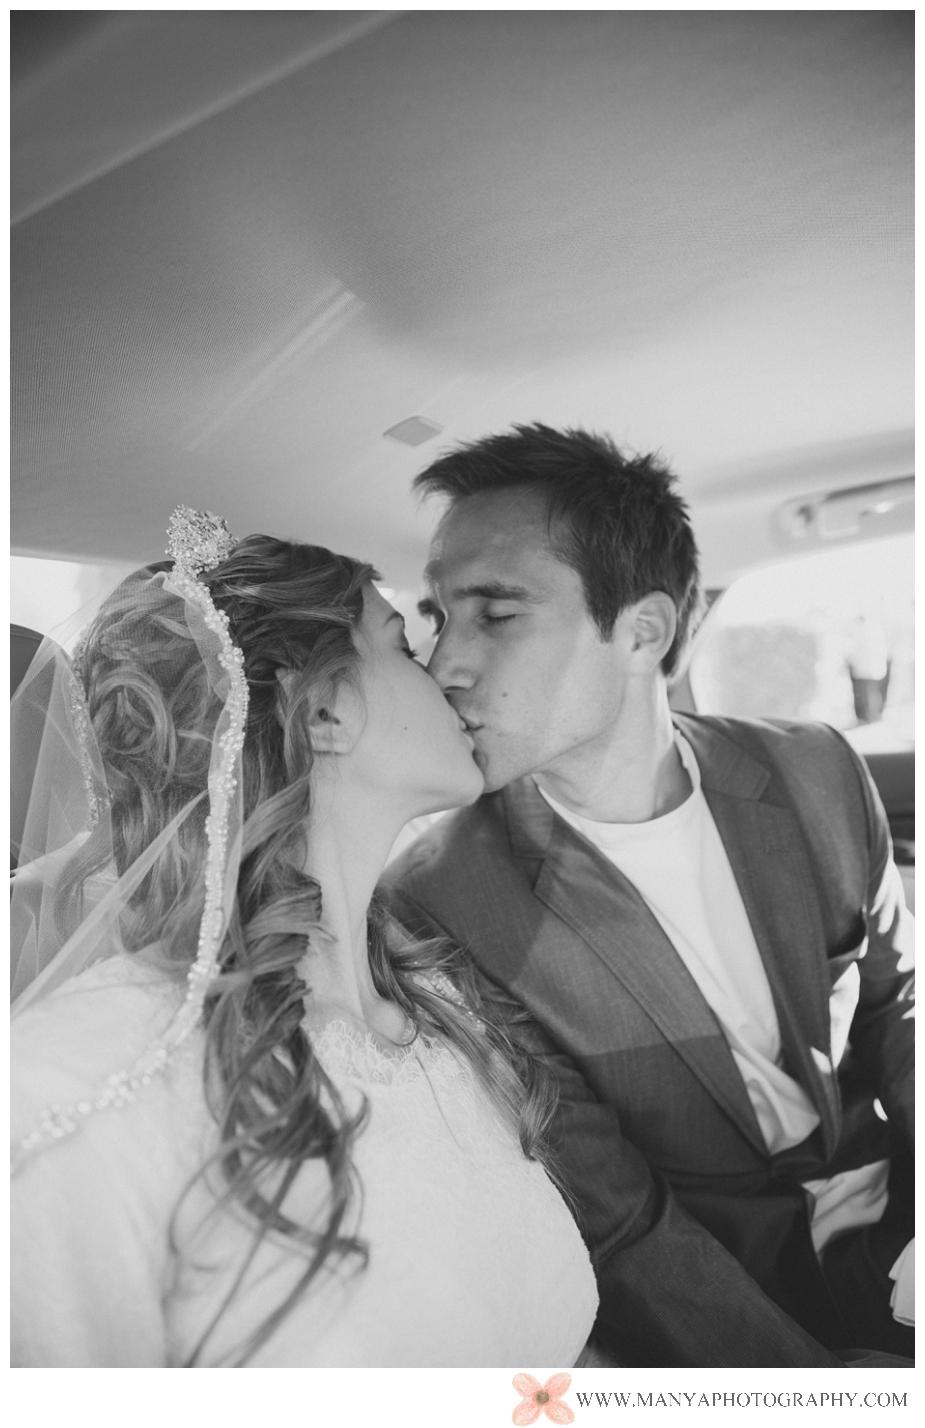 2013-07-23_0019 - Orange County Wedding Photography